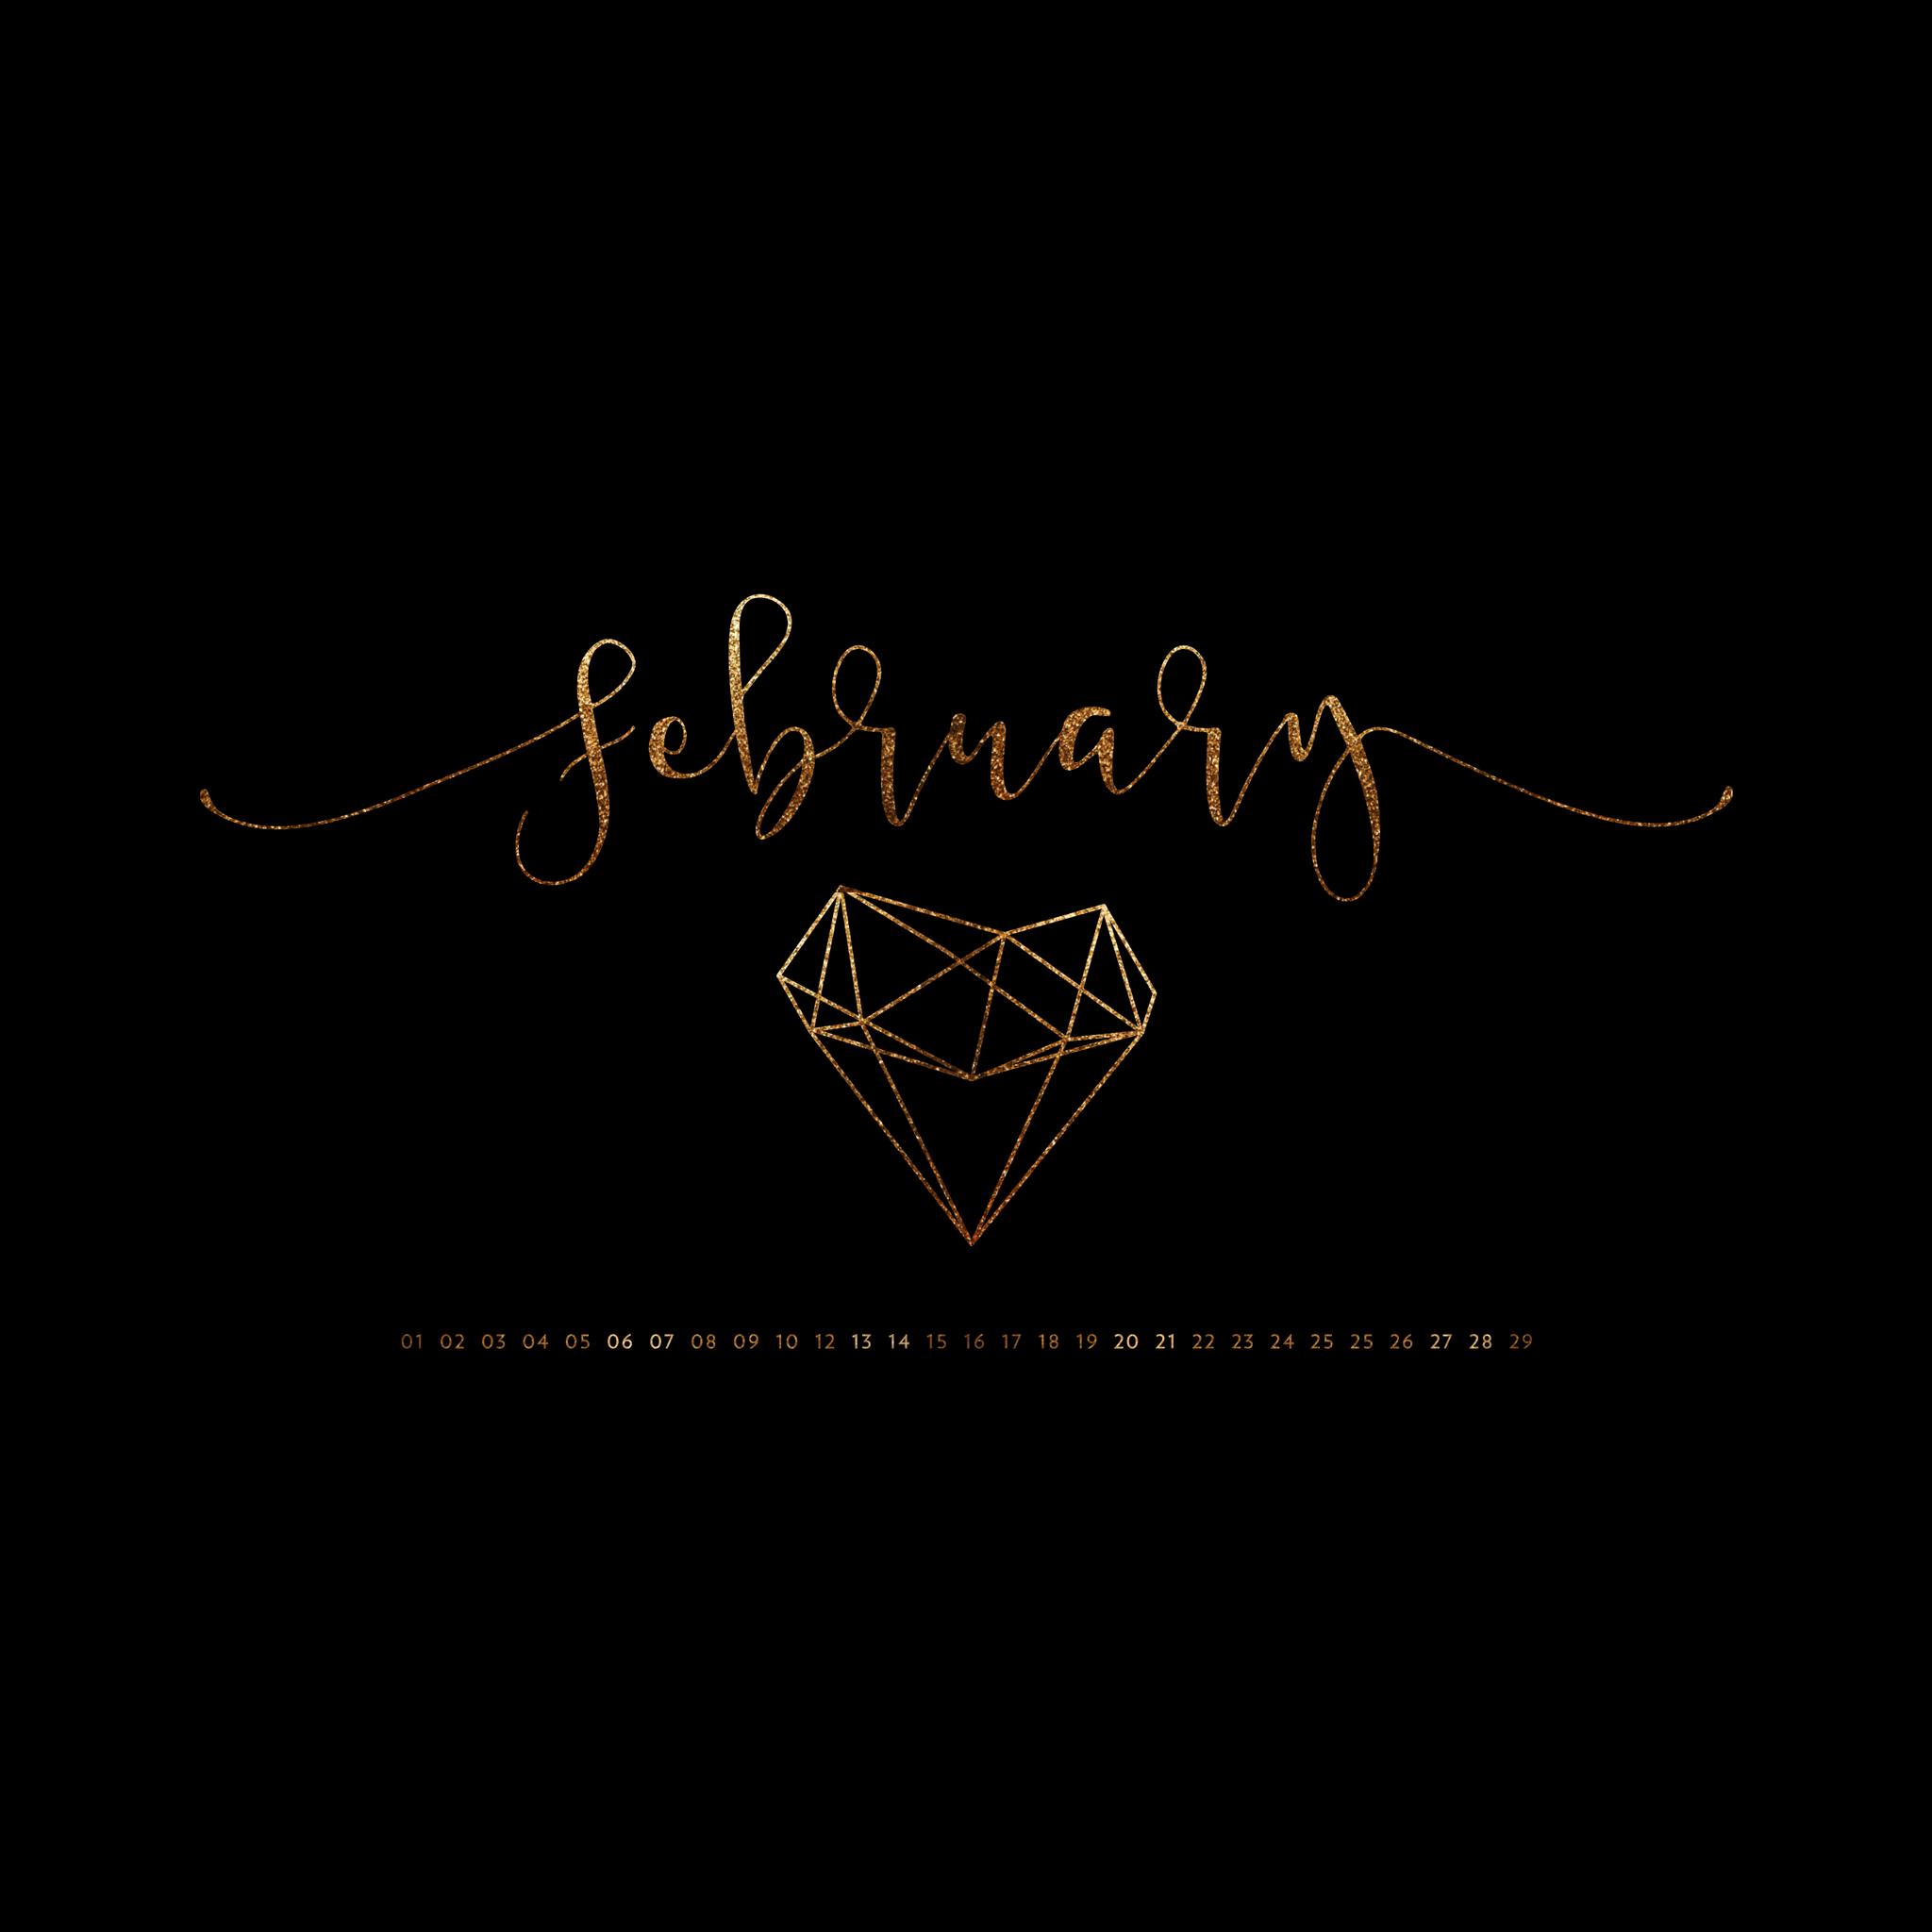 February 2016 Desktop Calendar Wallpaper Paper Leaf 2048x2048